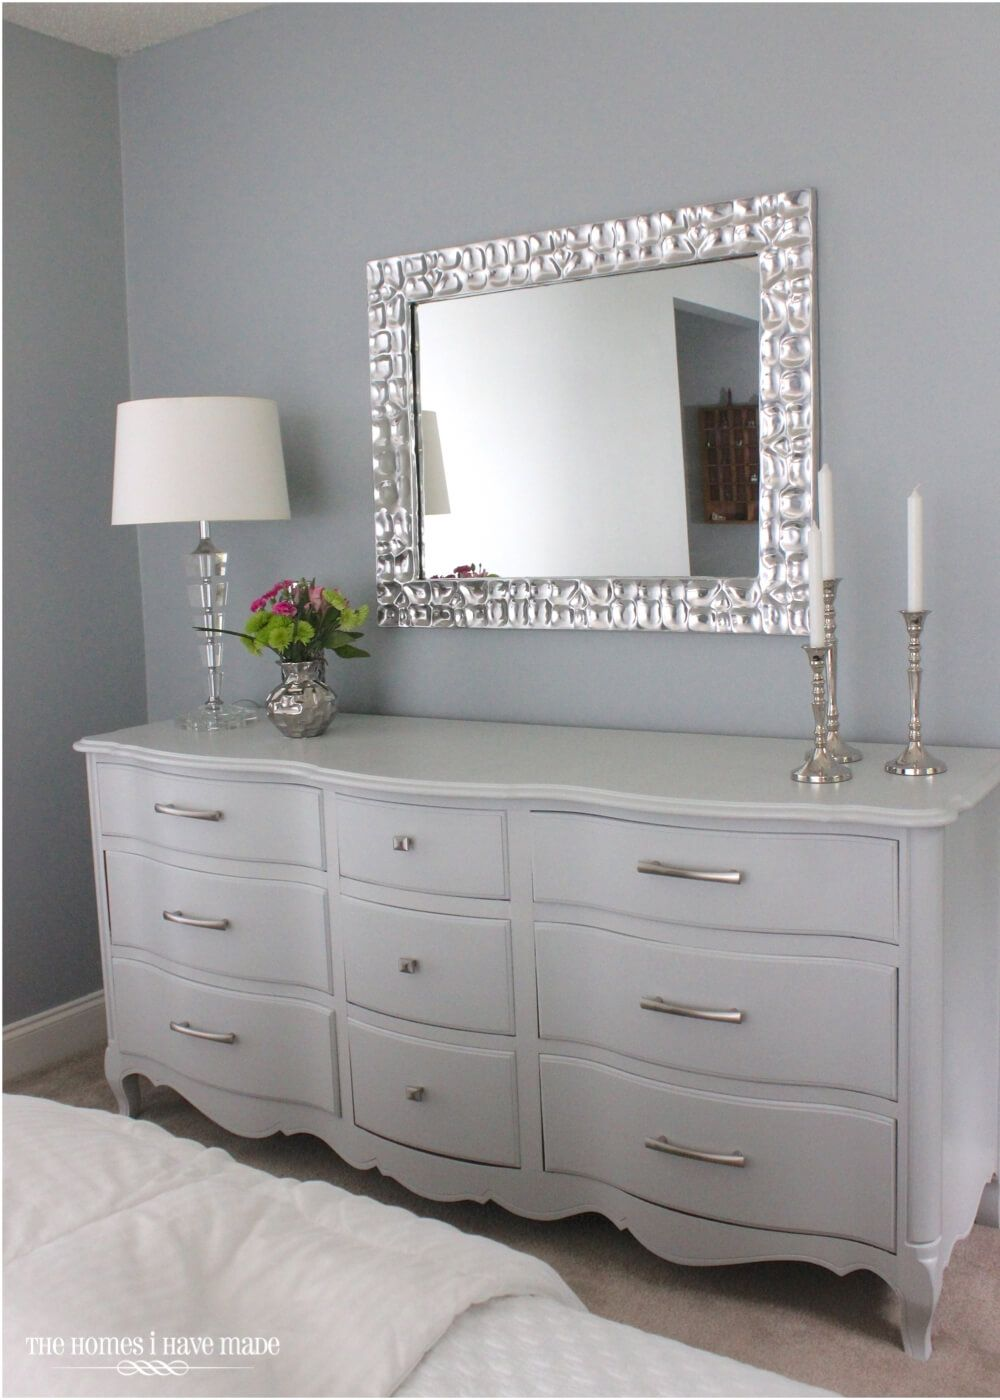 33 Mirror Decoration Ideas To Brighten Your Home Room Decor Bedroom Decor Bedroom Makeover